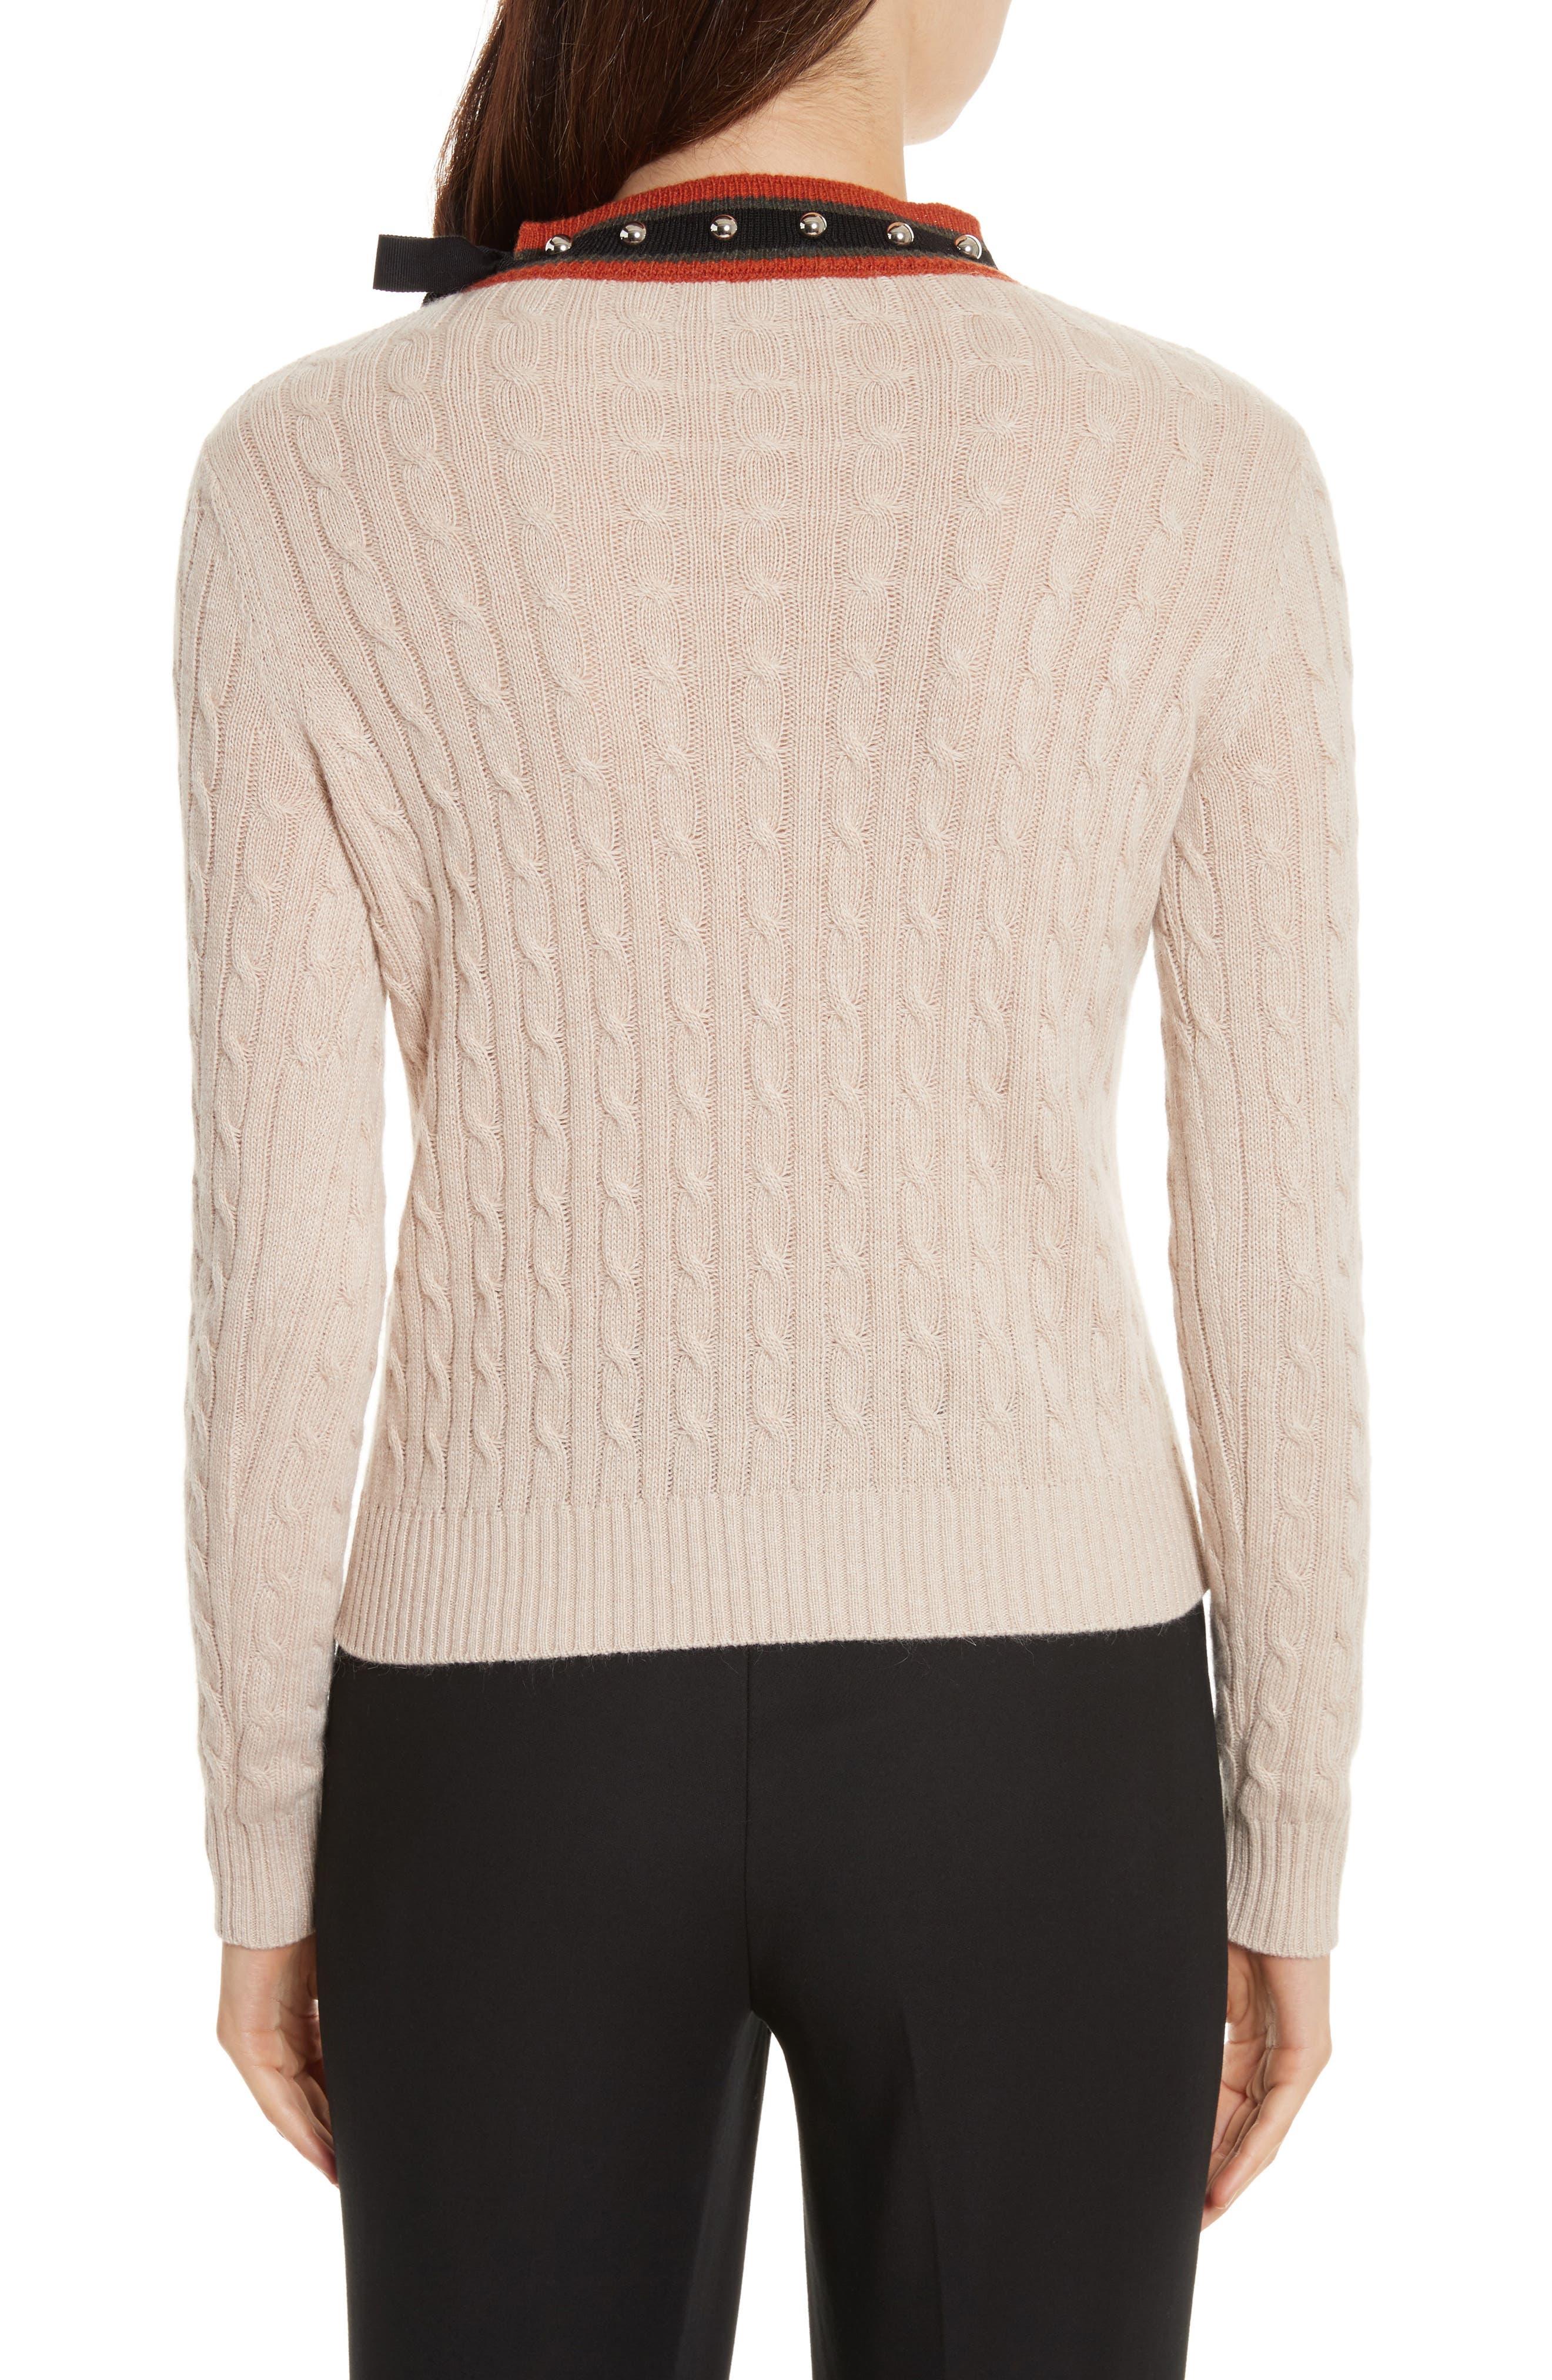 Printed Wool & Angora Blend Sweater,                             Alternate thumbnail 2, color,                             Deserto Chiaro